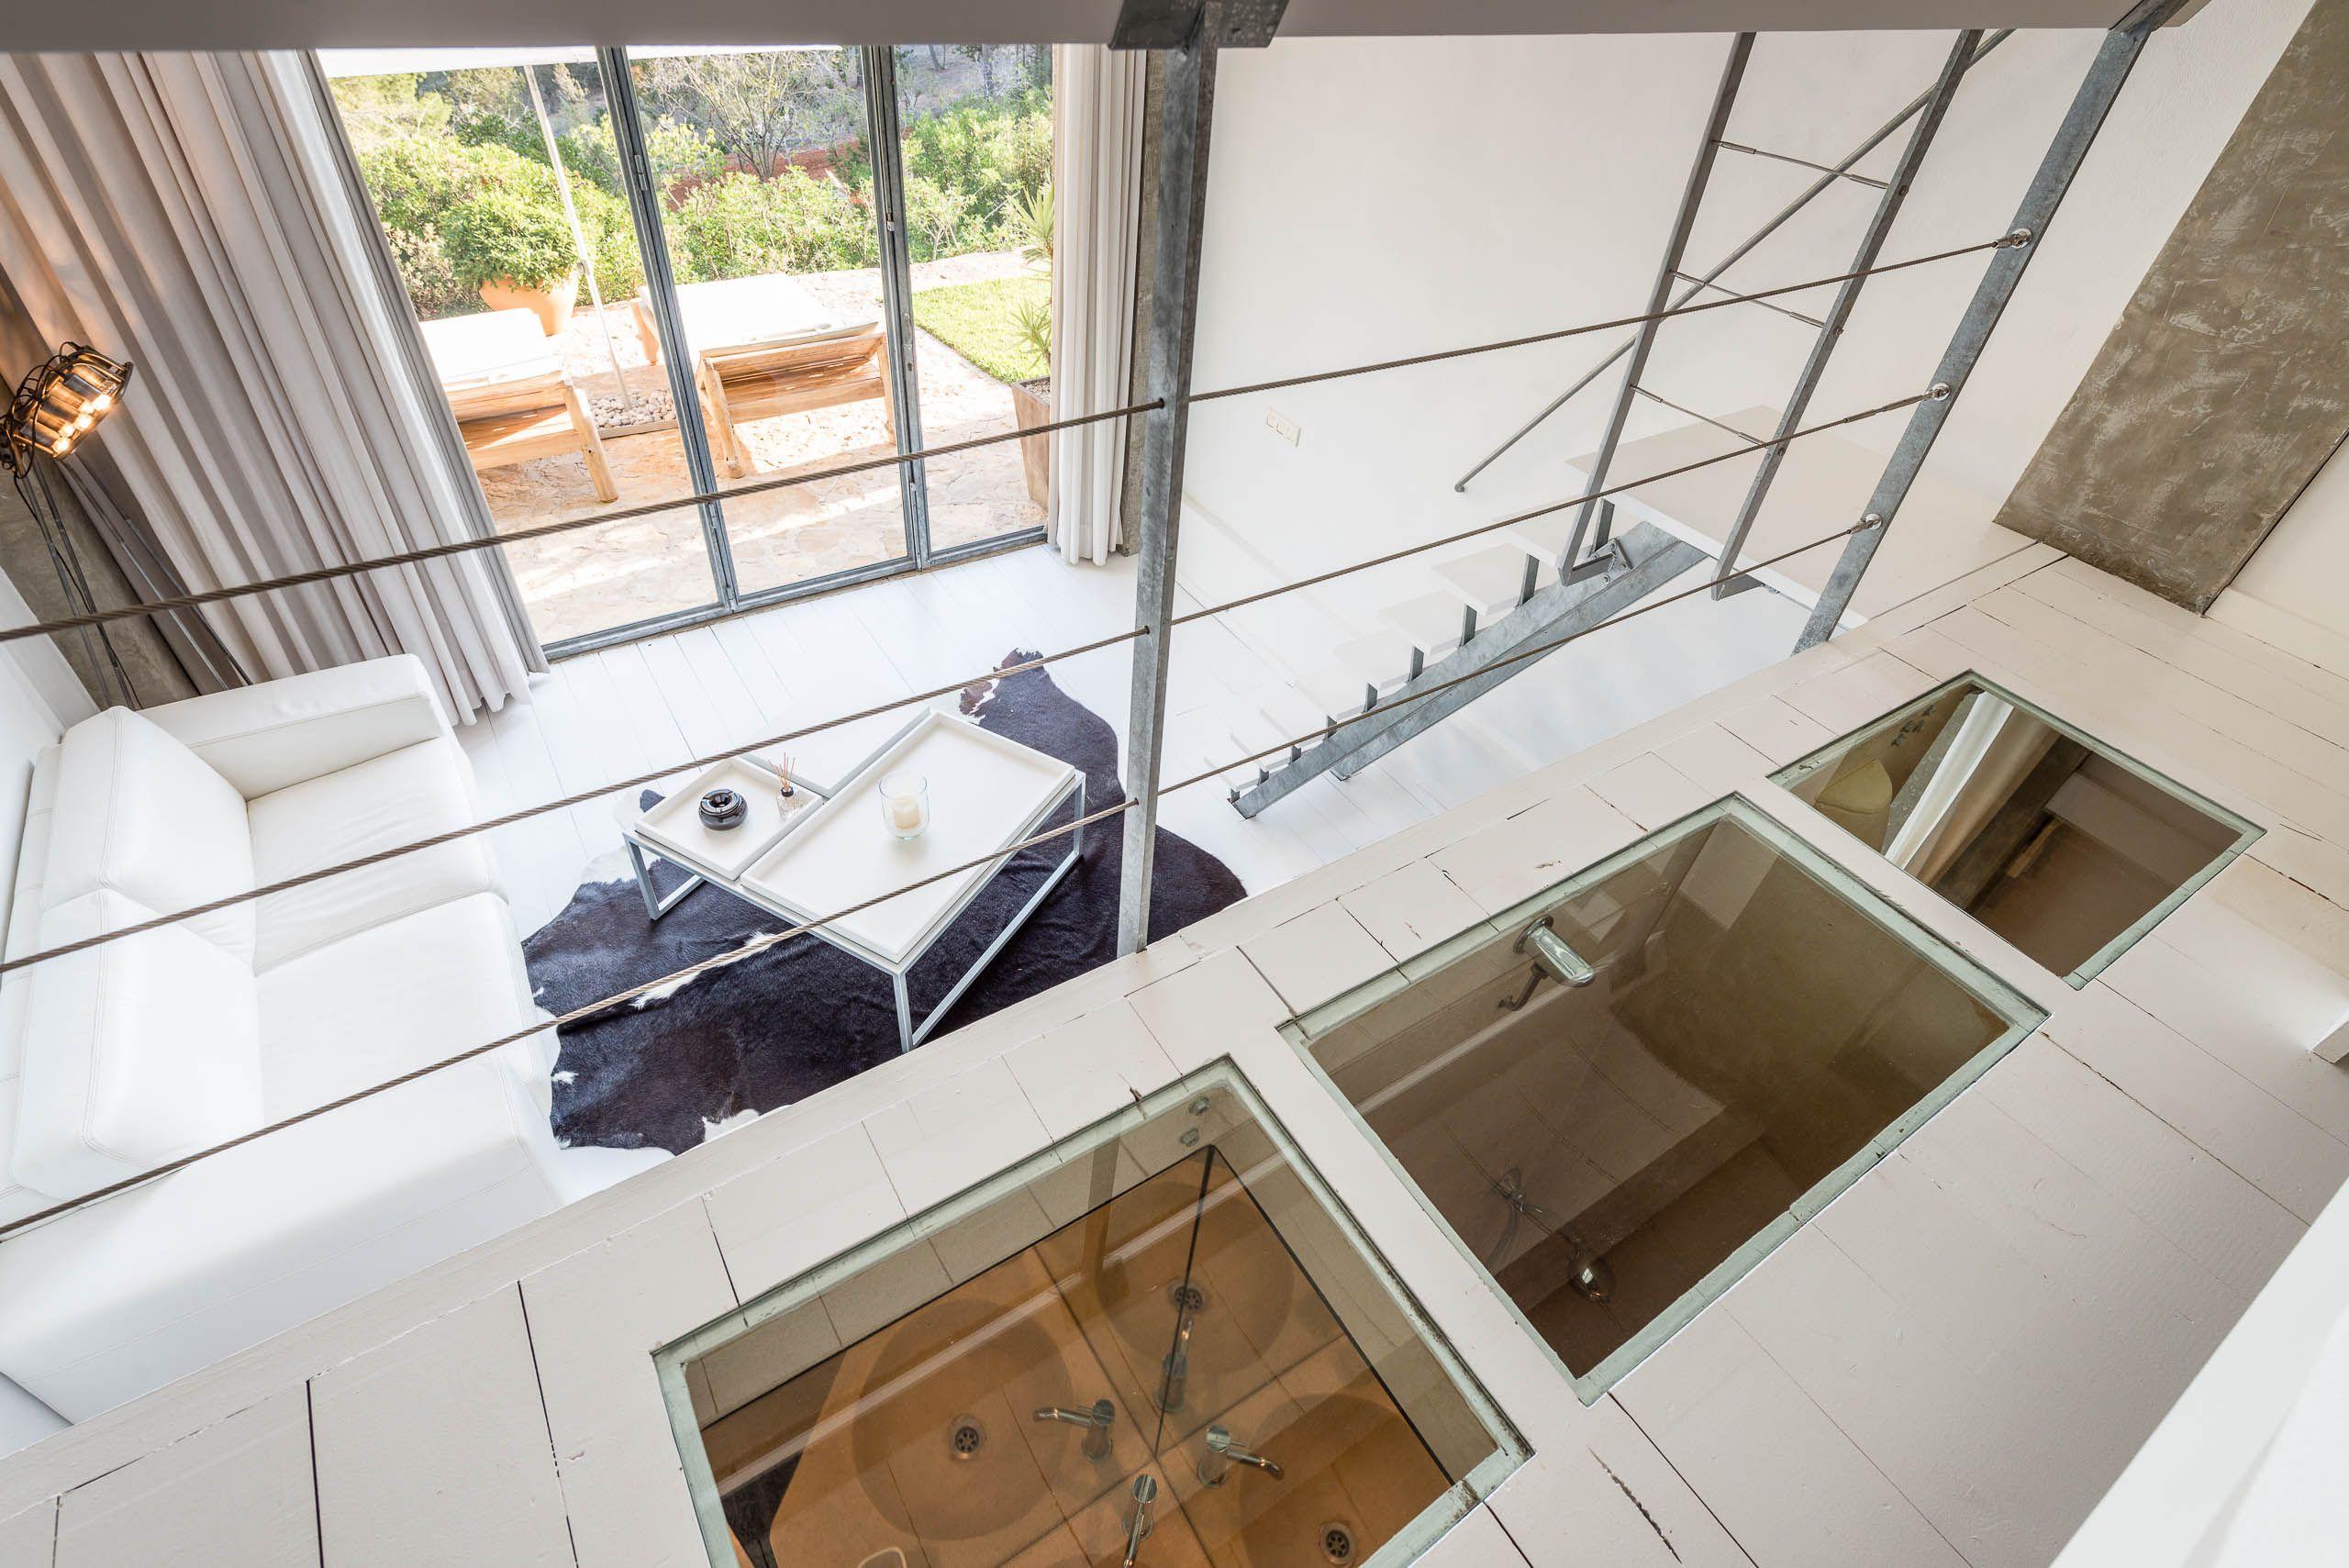 Luxury 6 bedroom villa near Ibiza town, luxury villa, ultramodern rental villa, rental property,